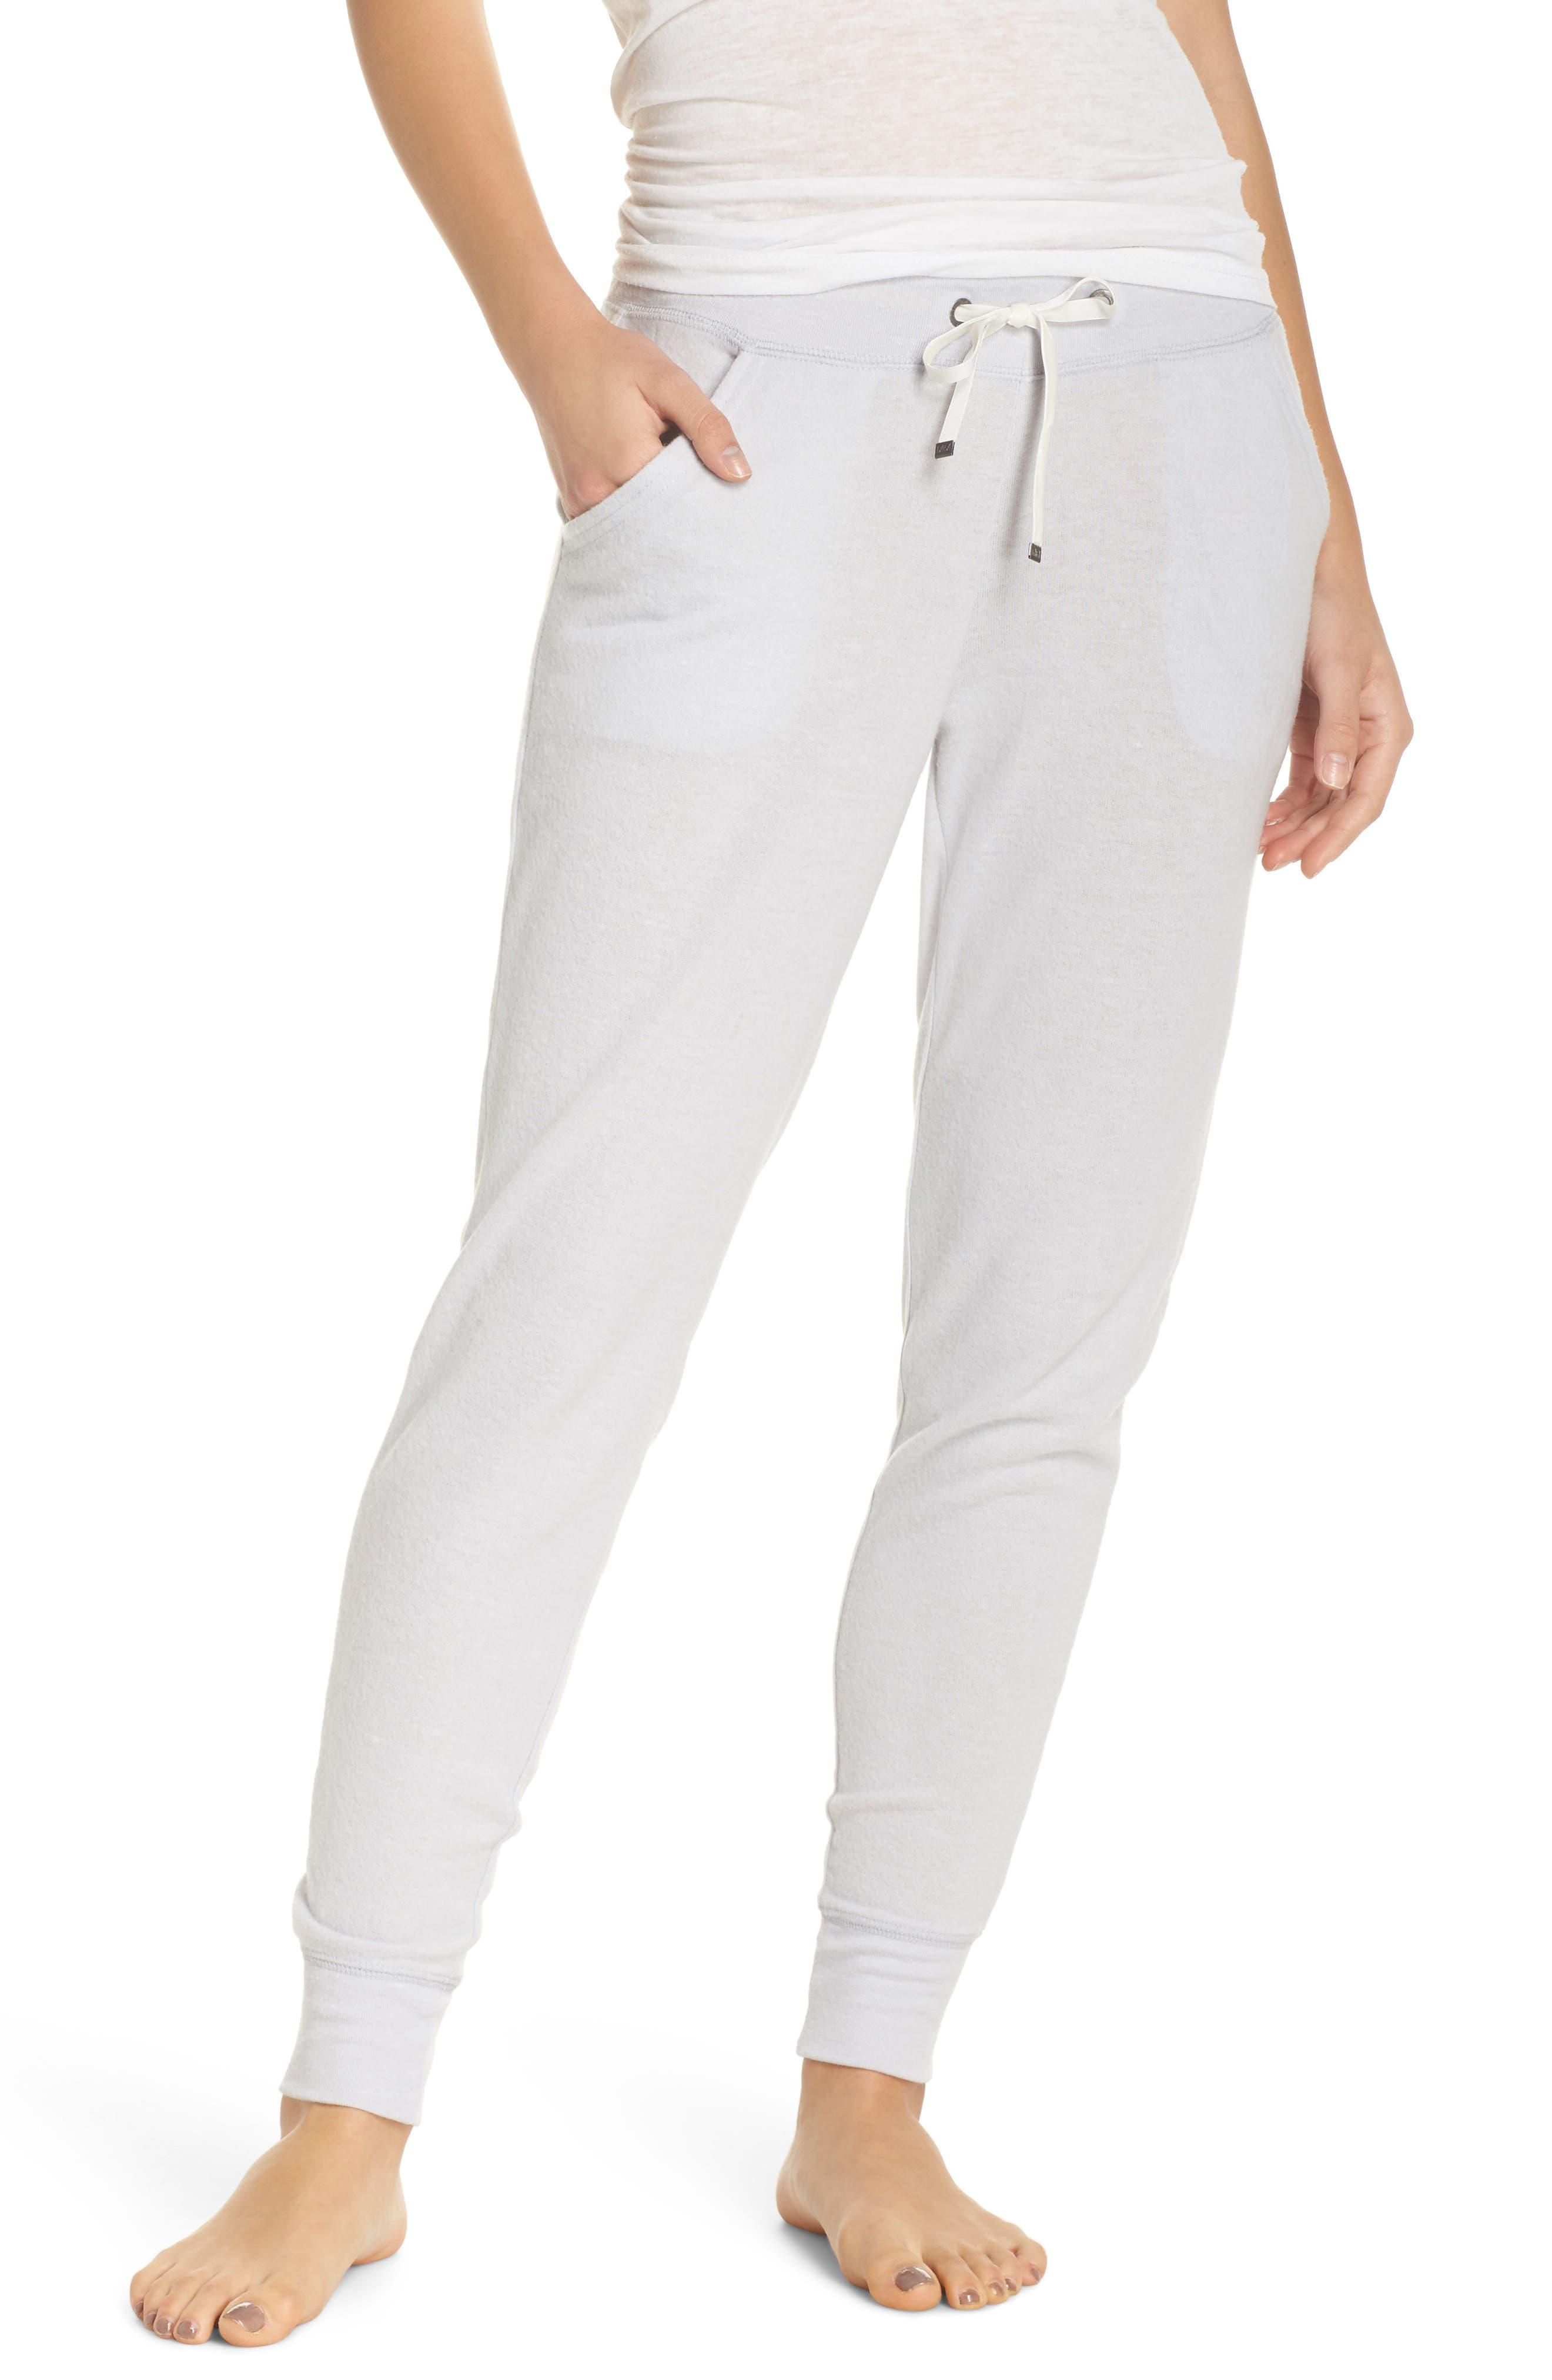 Winter Dreams Lounge Jogger Pants,                         Main,                         color, Grey Micro